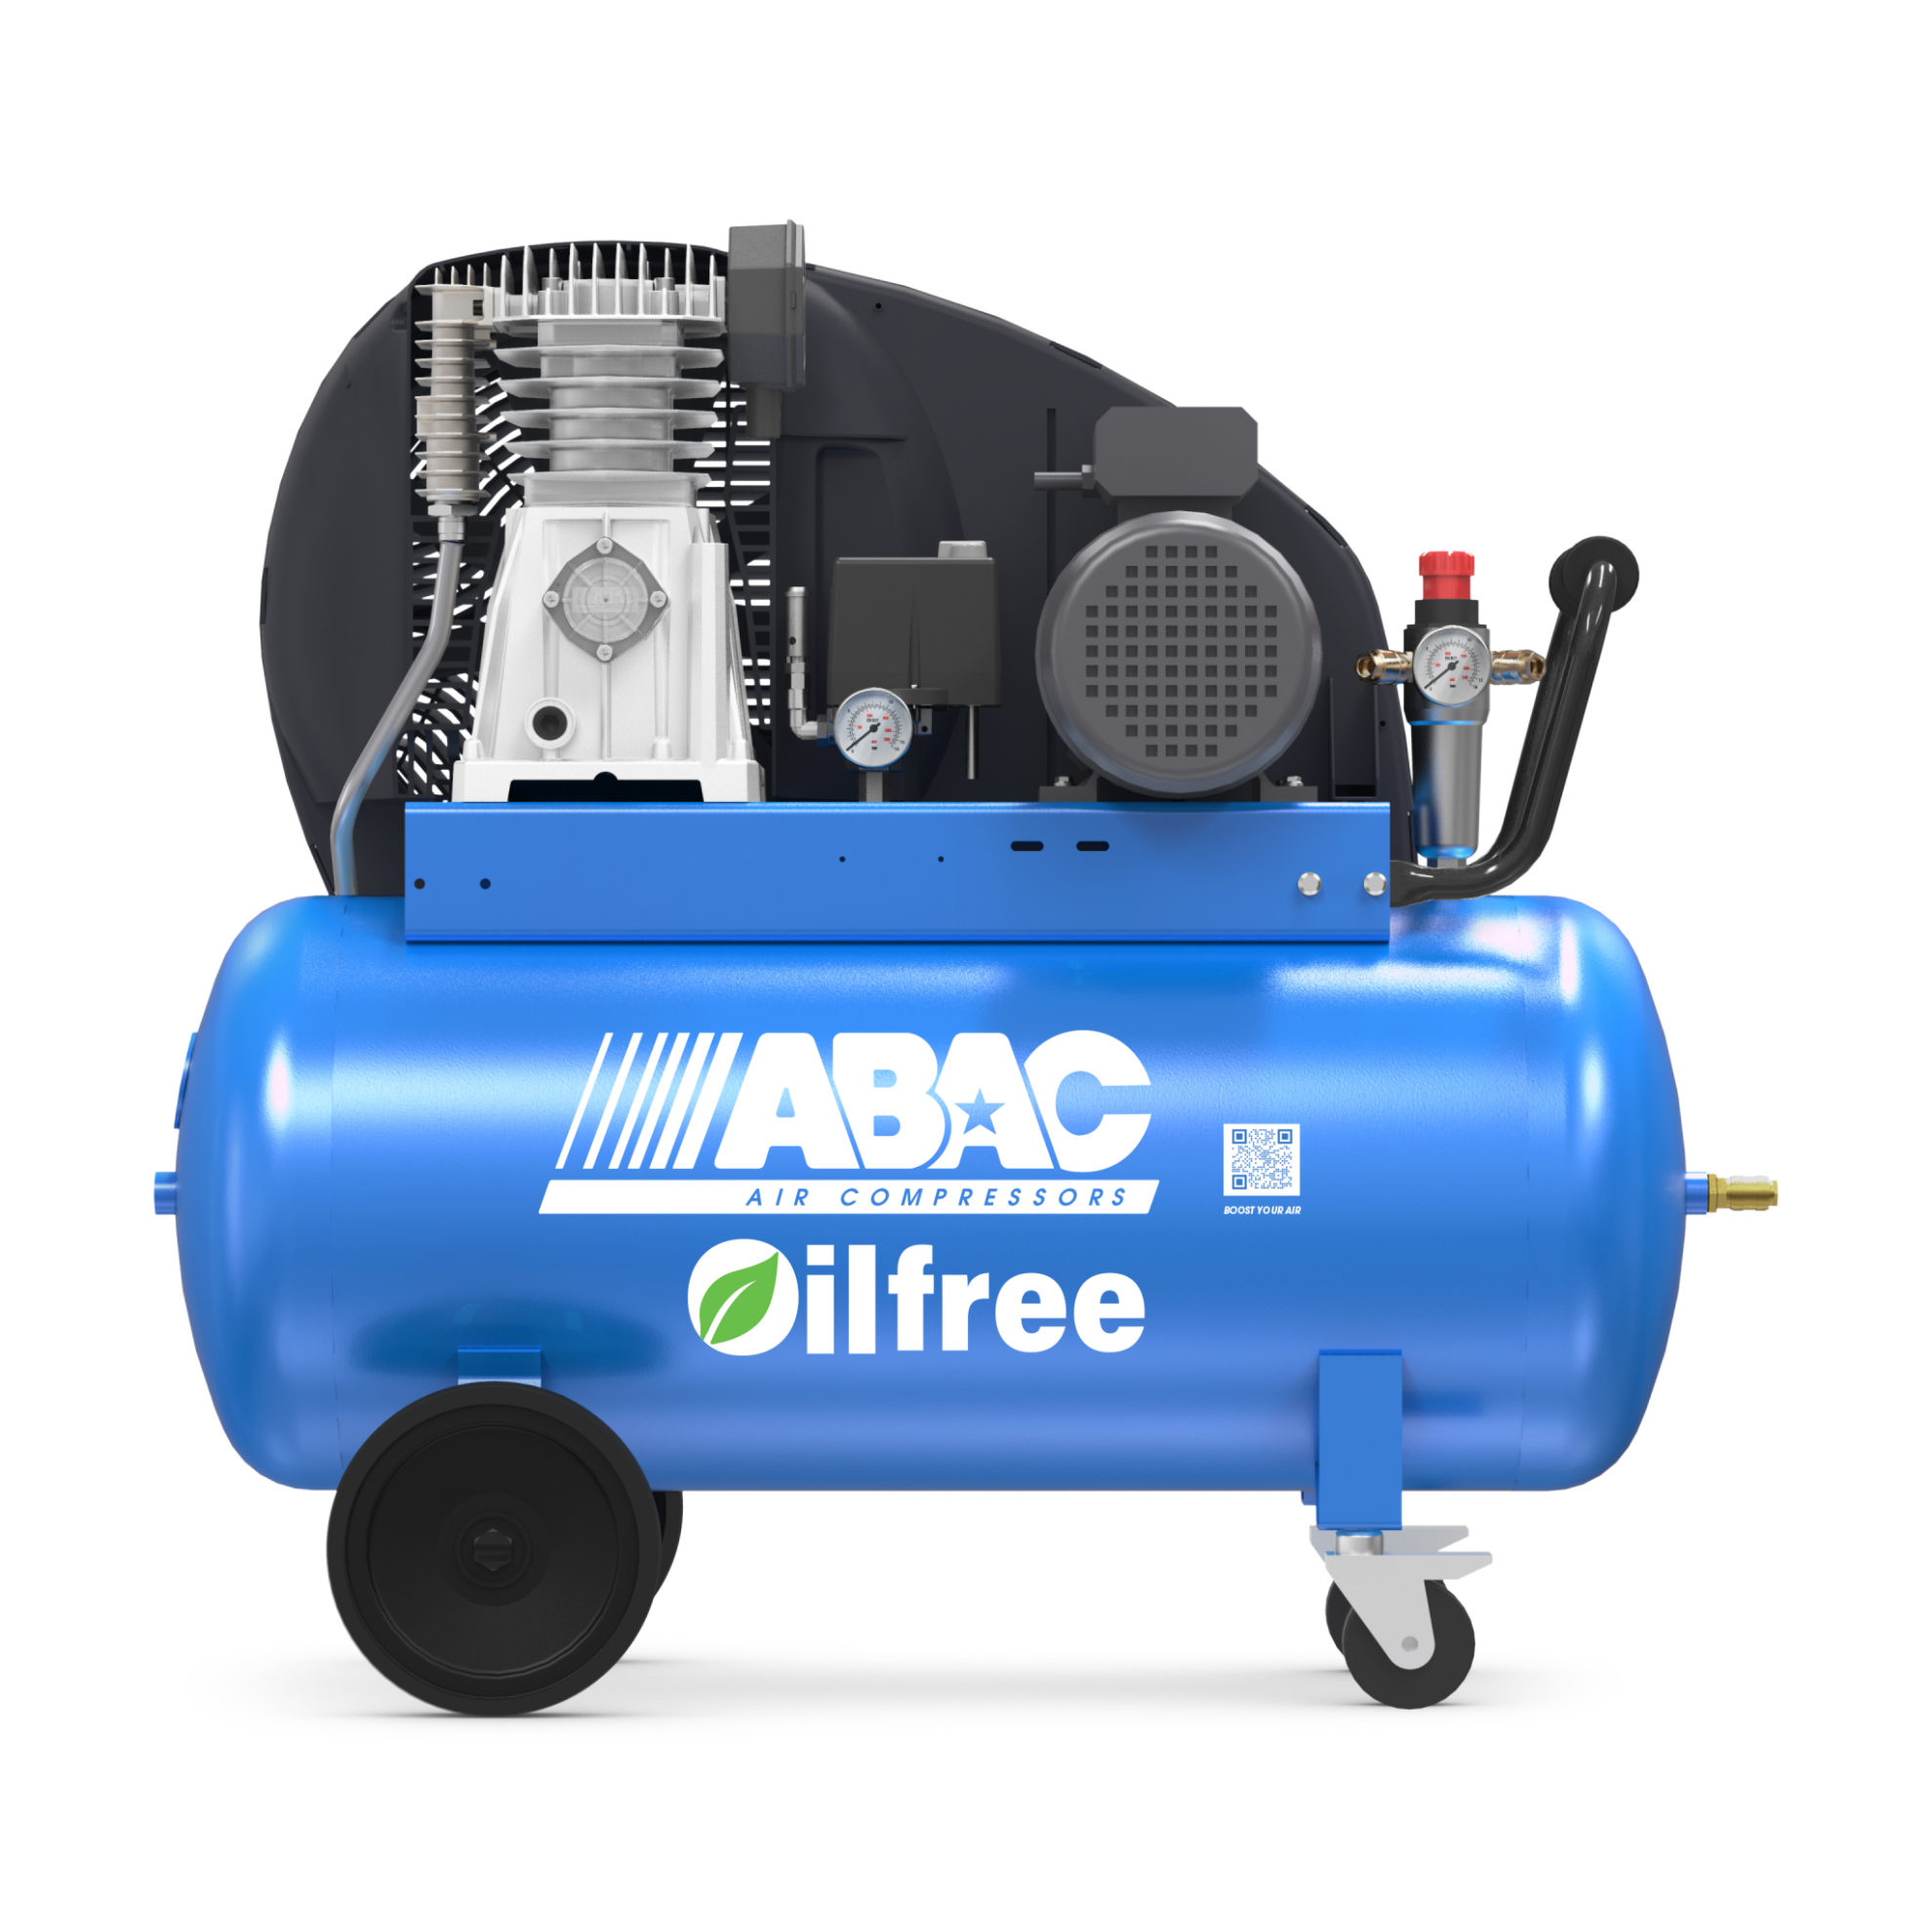 Compresor Abac 3 hp sin aceite